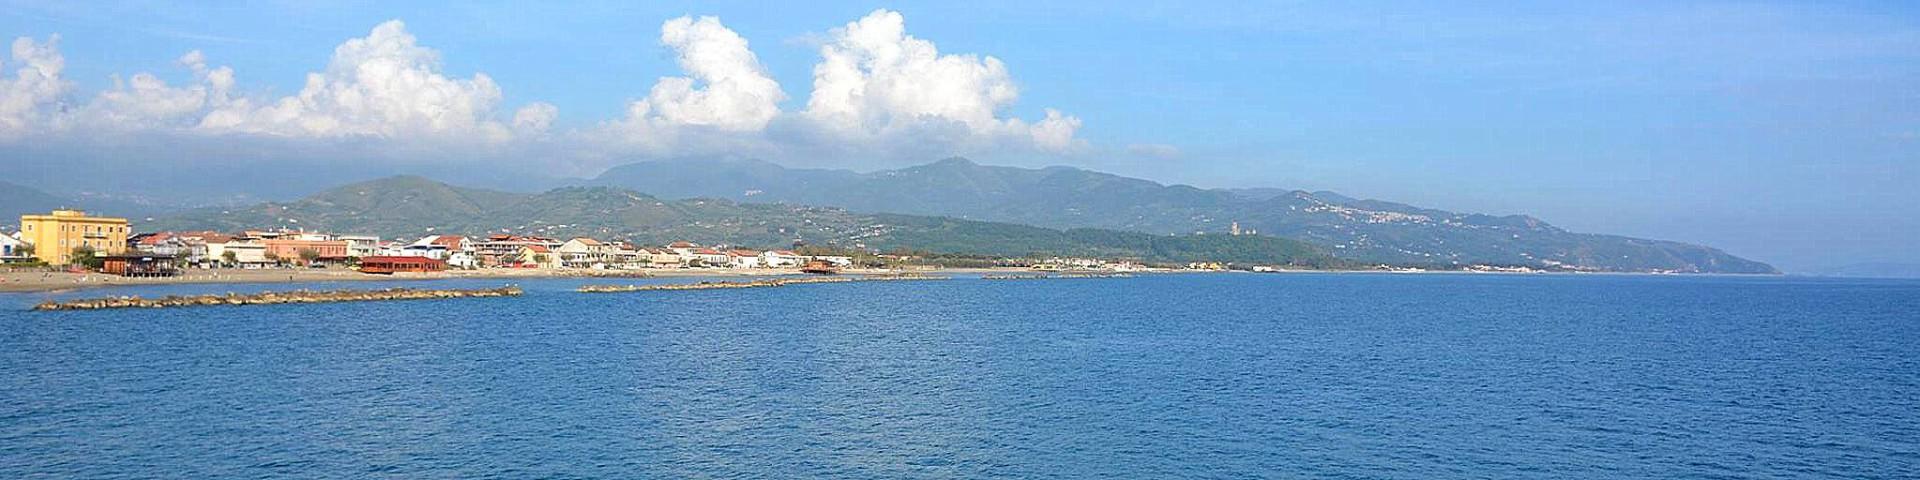 Marina di Casal Velino, pohled celý záliv, v pozadí Velia a Marina di Ascea